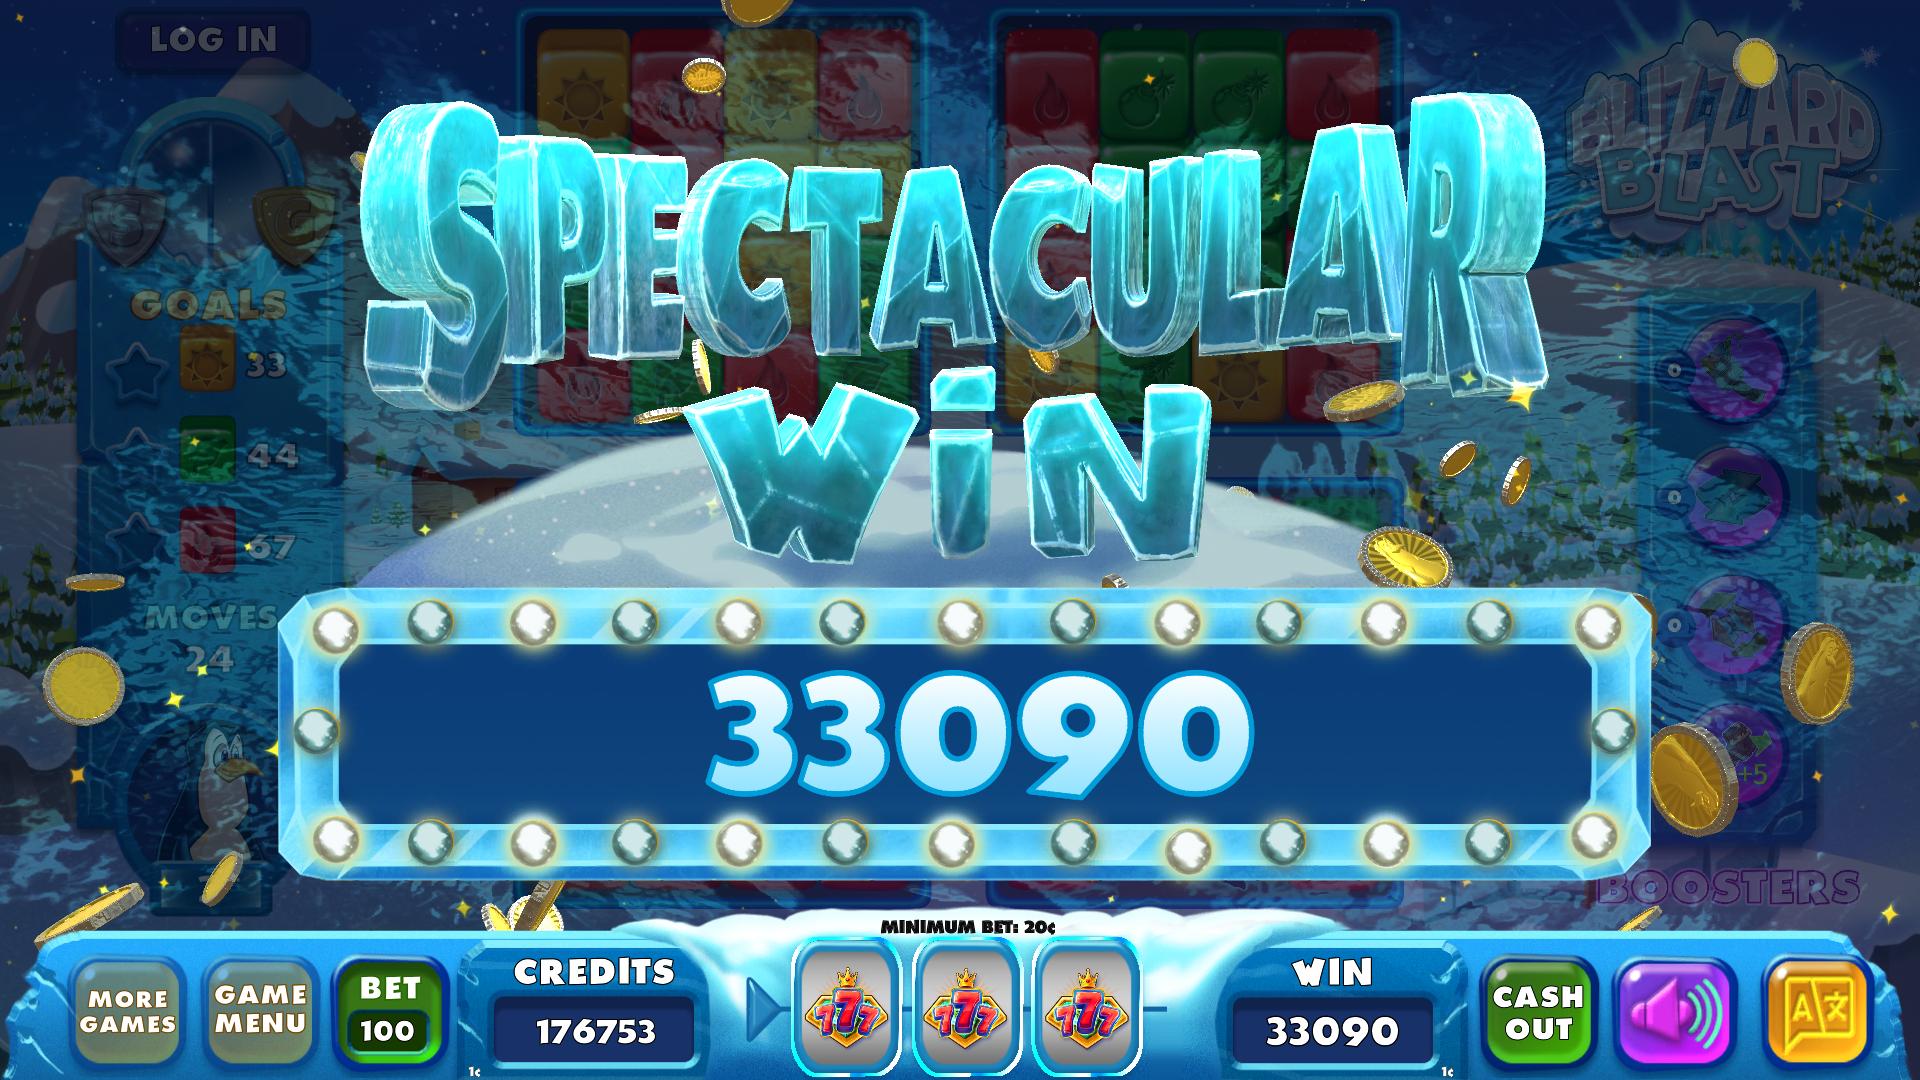 Blizzard Blast Spectacular Win Celebration